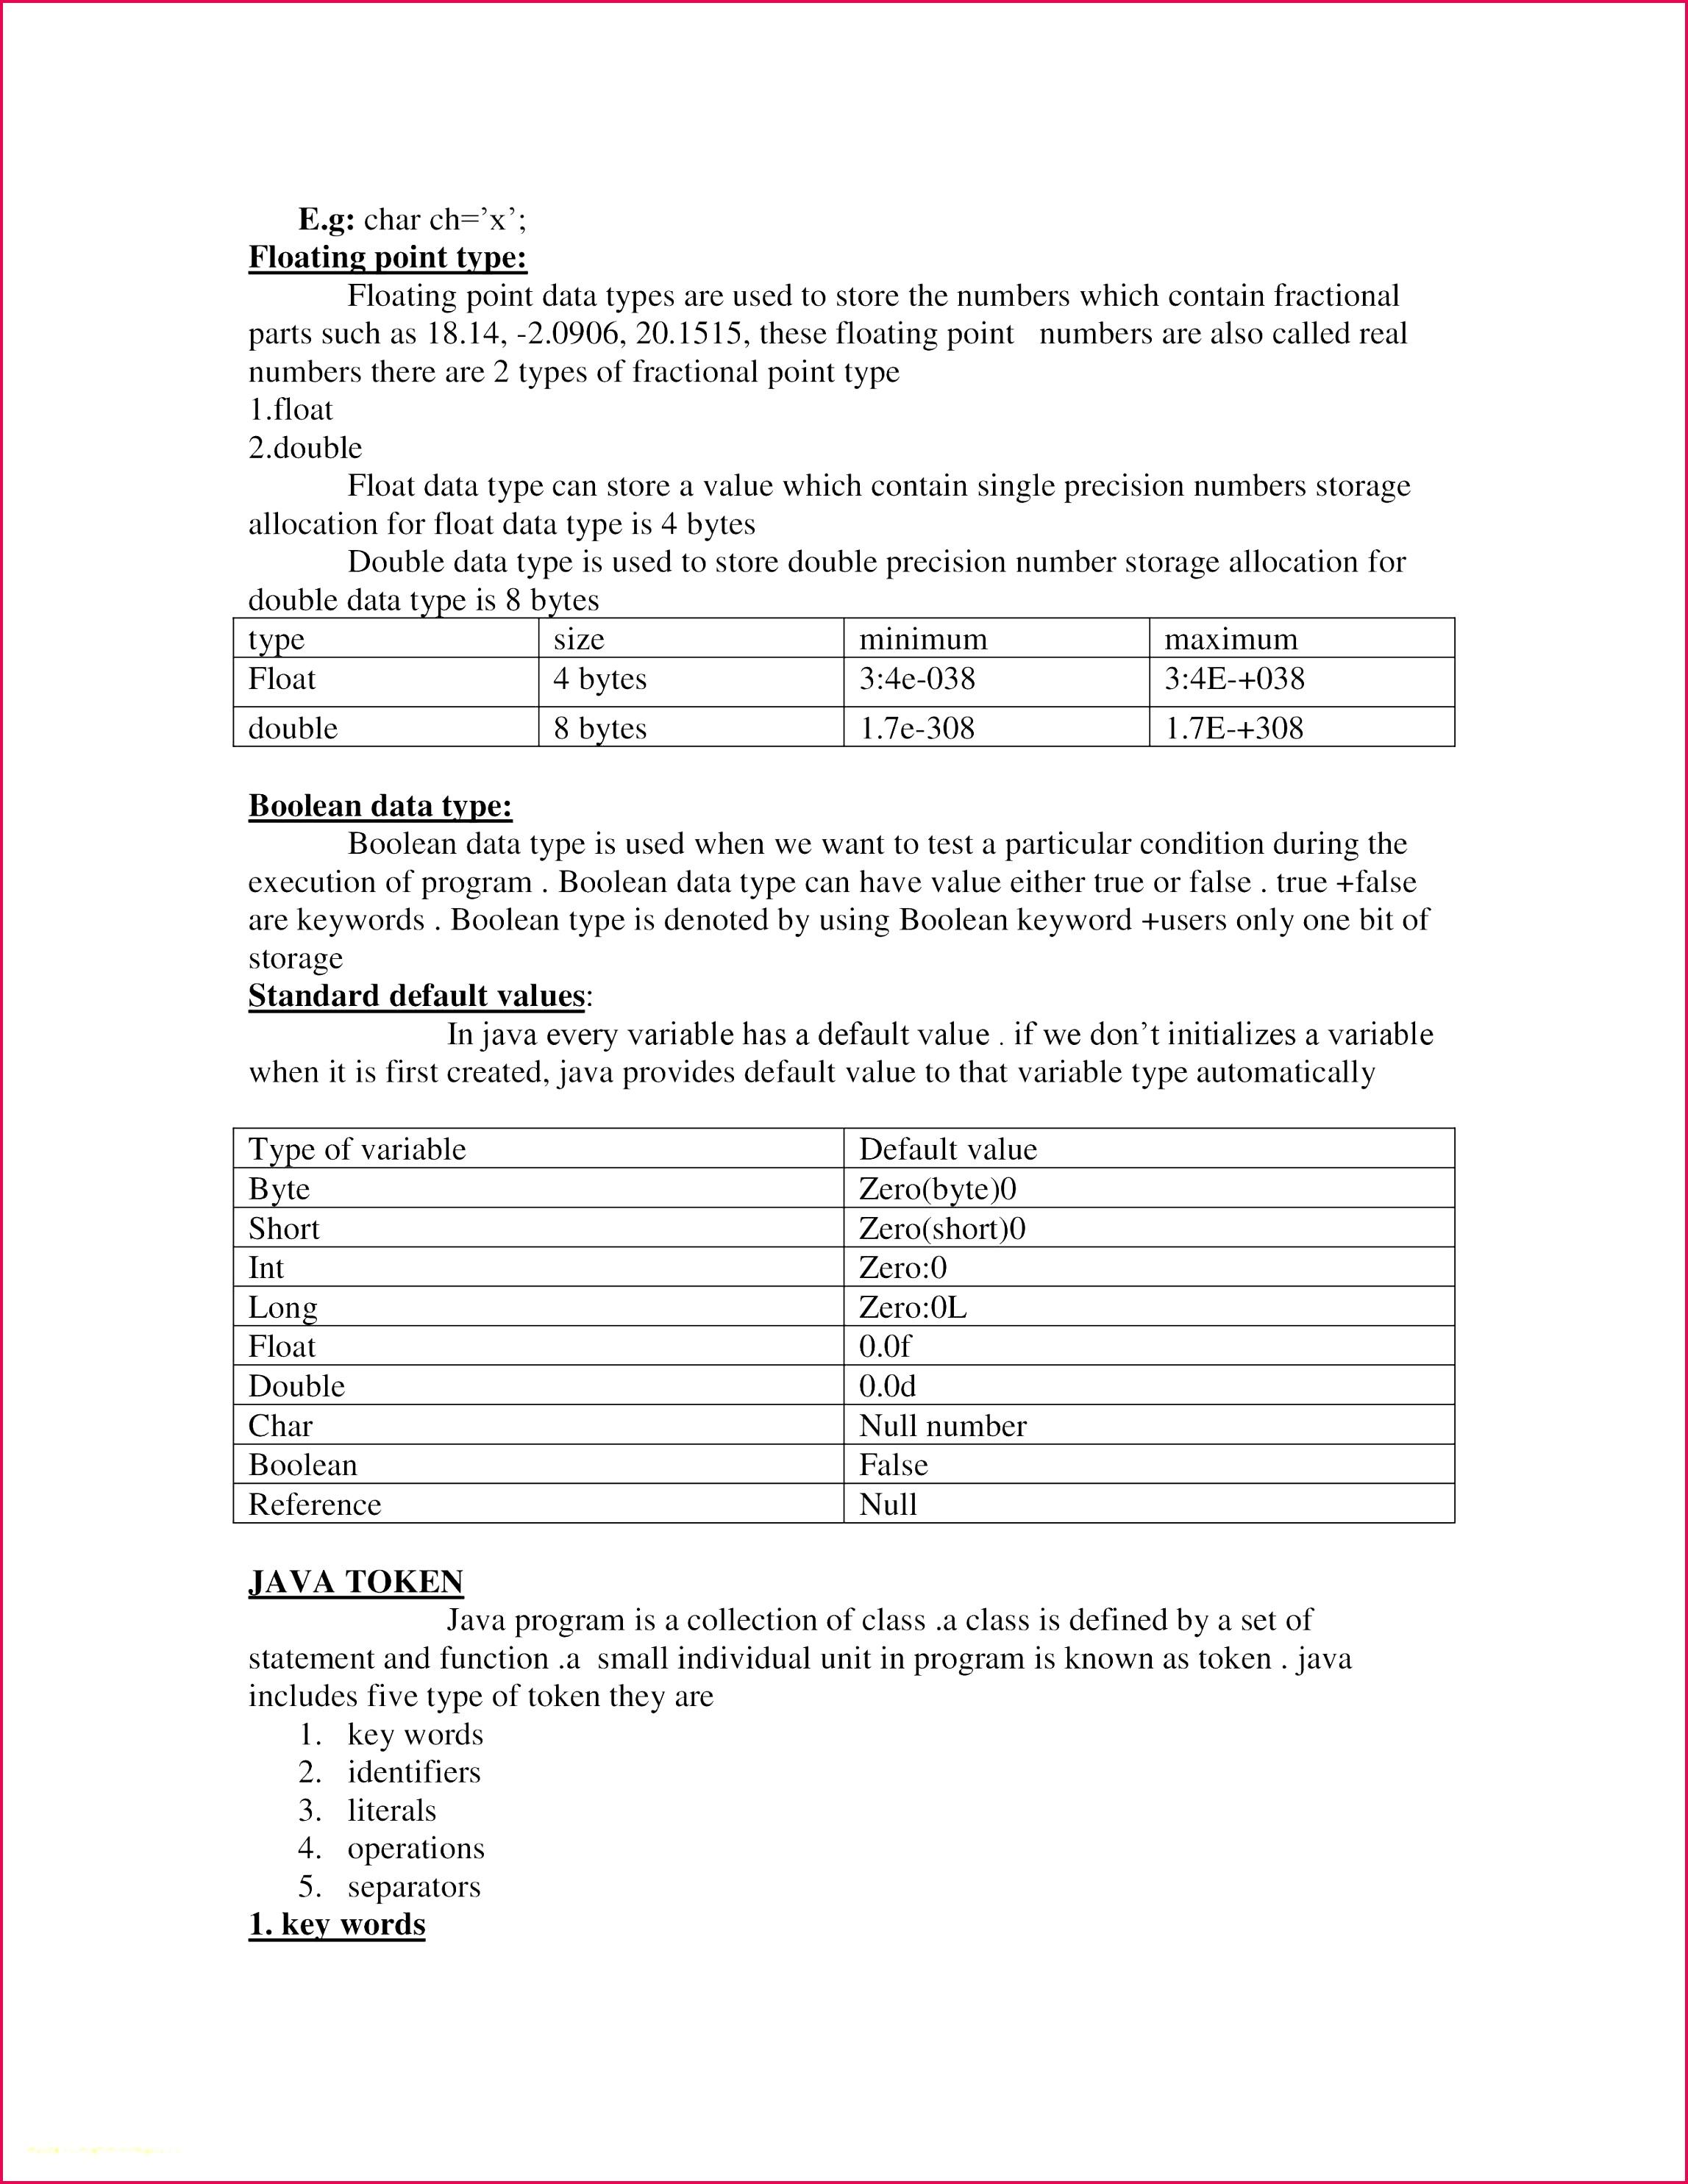 certificate of pletion templates powerpoint powerpoint newsletter plete microsoft word newsletter template fresh t certificate template word 2007 luxury 30 new microsoft word